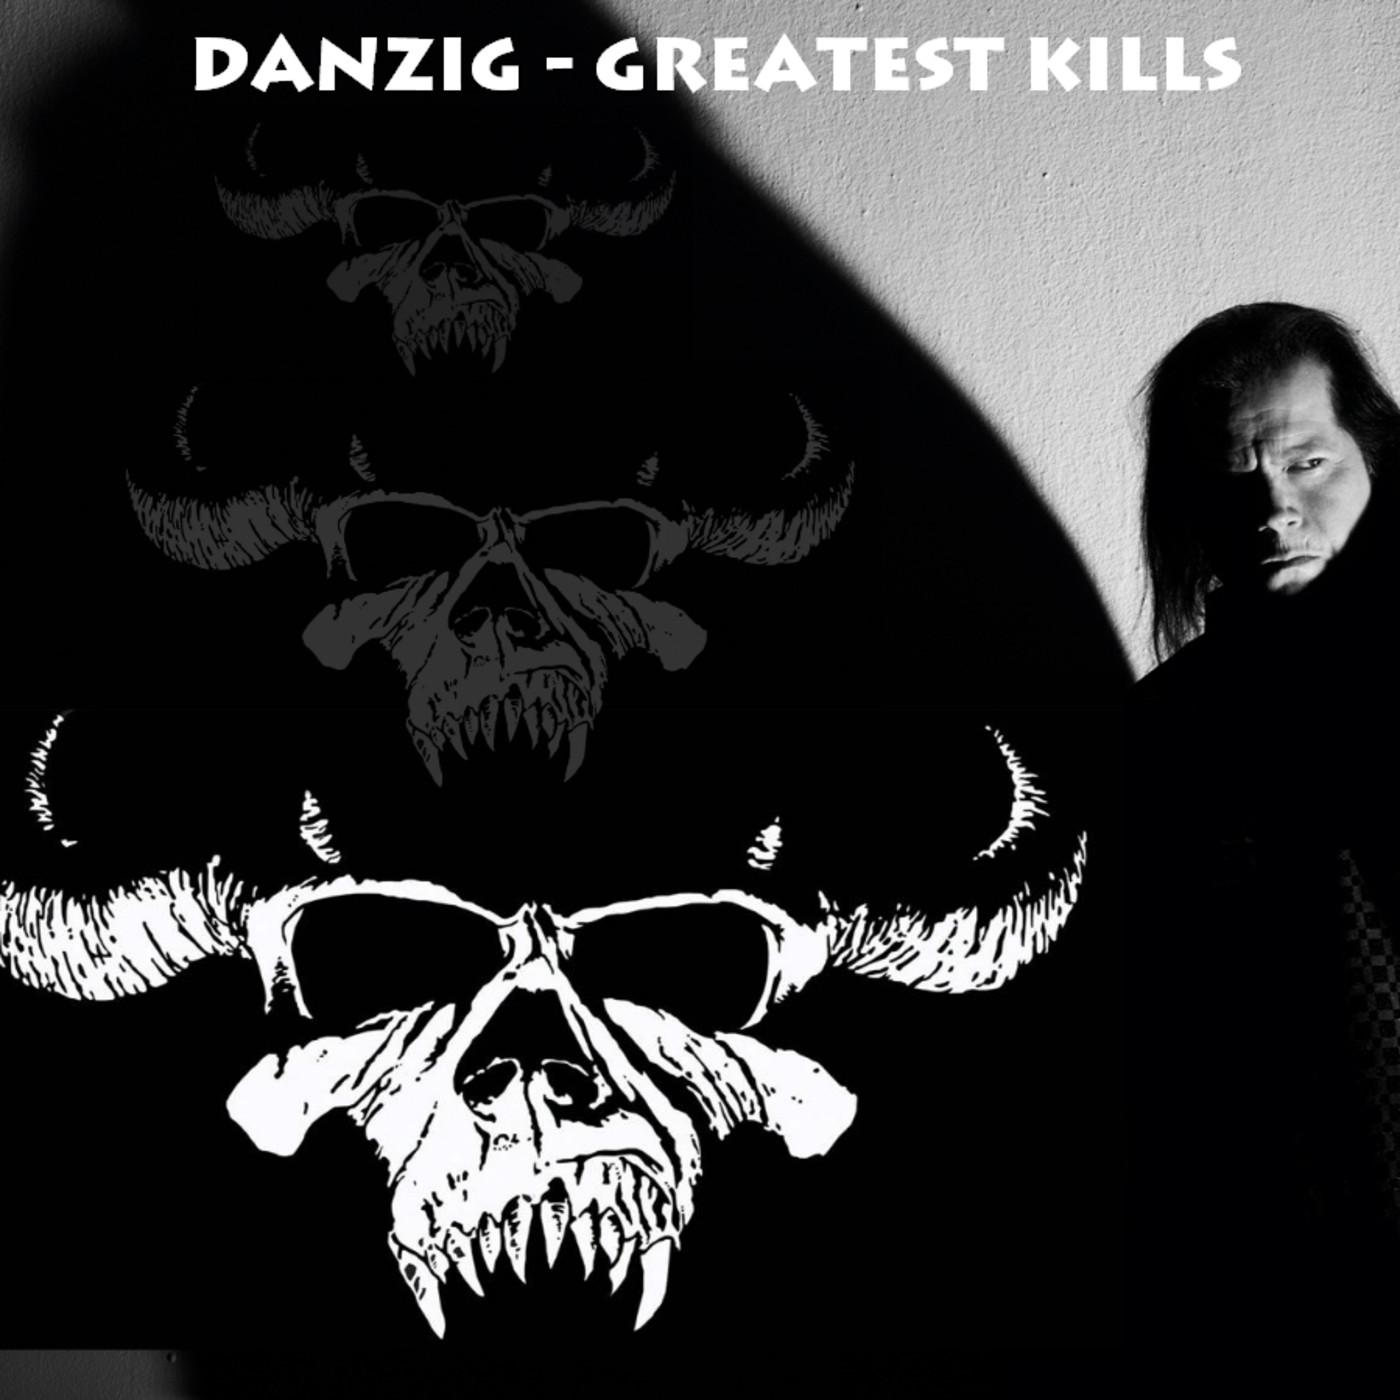 Duskbunker - Danzig [Greatest Kills]